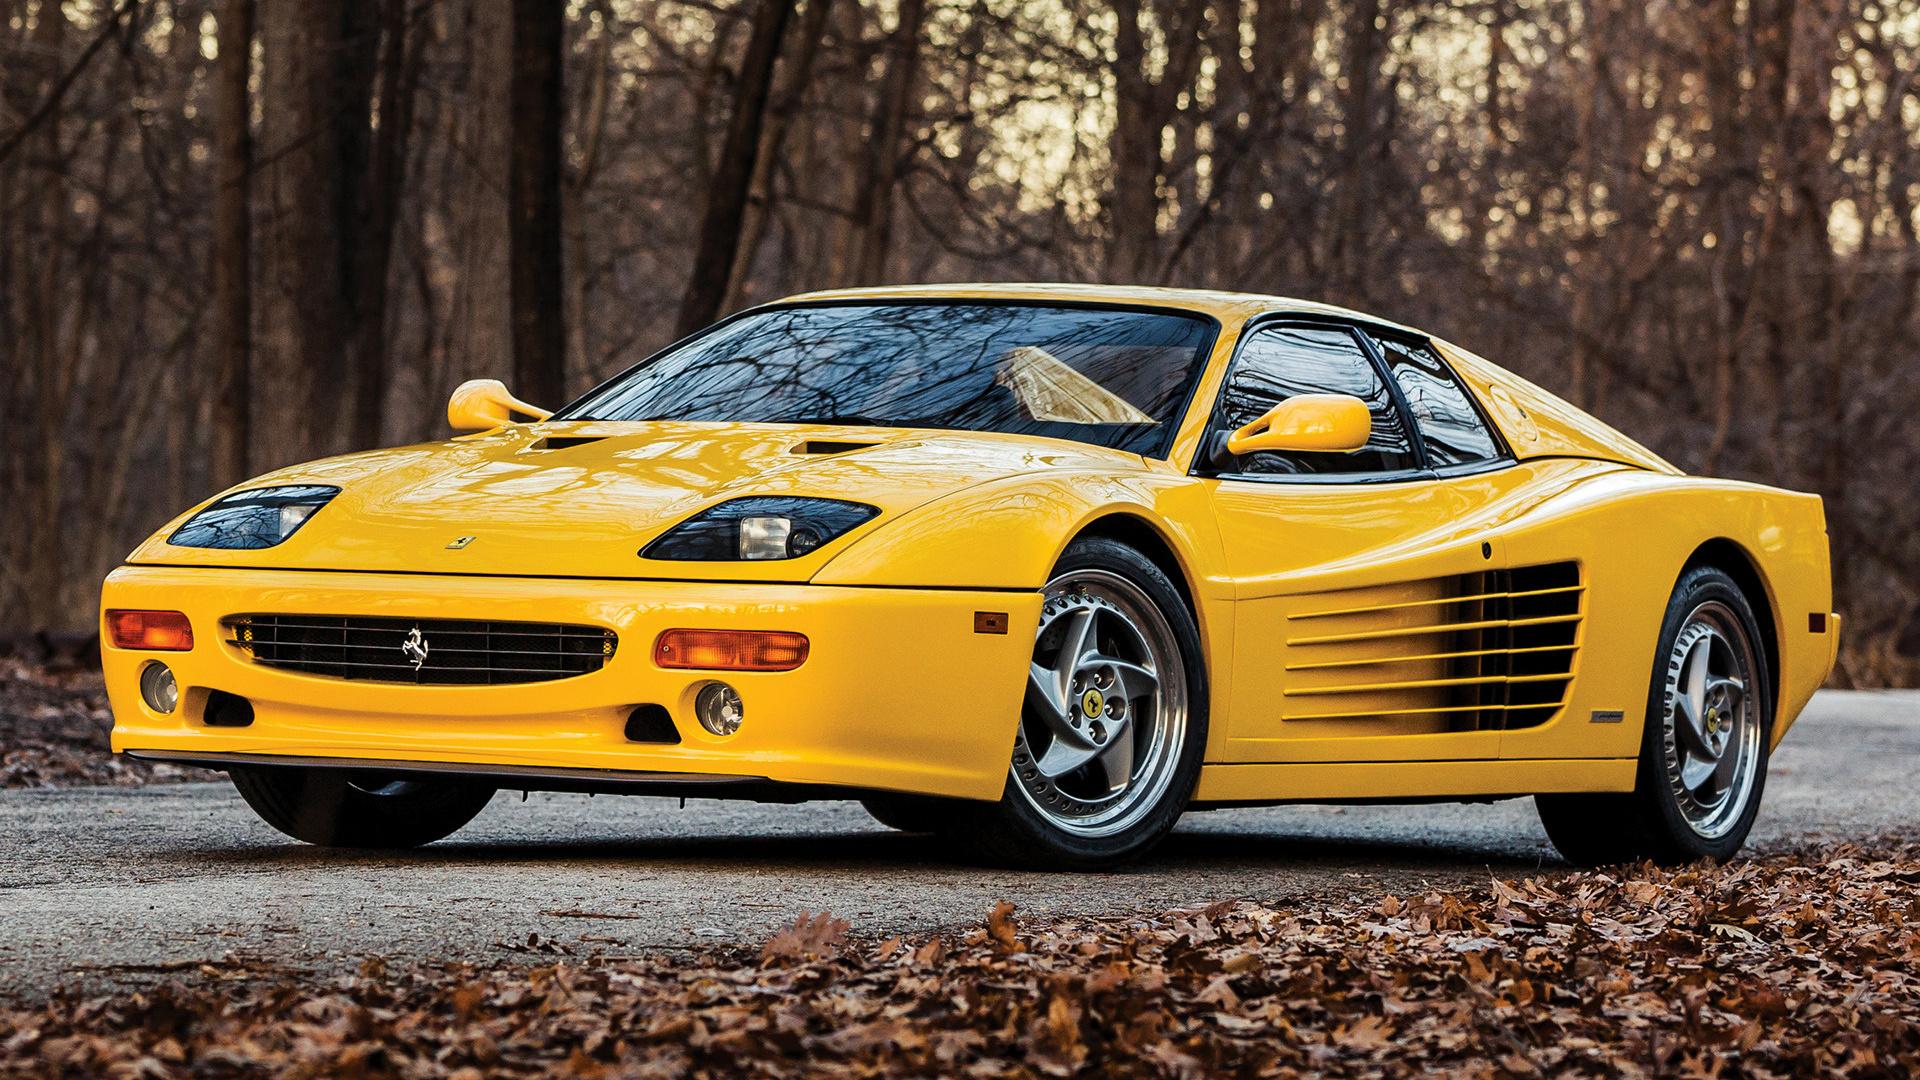 1995 Ferrari F512 M Us Hintergrundbilder Und Wallpaper In Hd Car Pixel